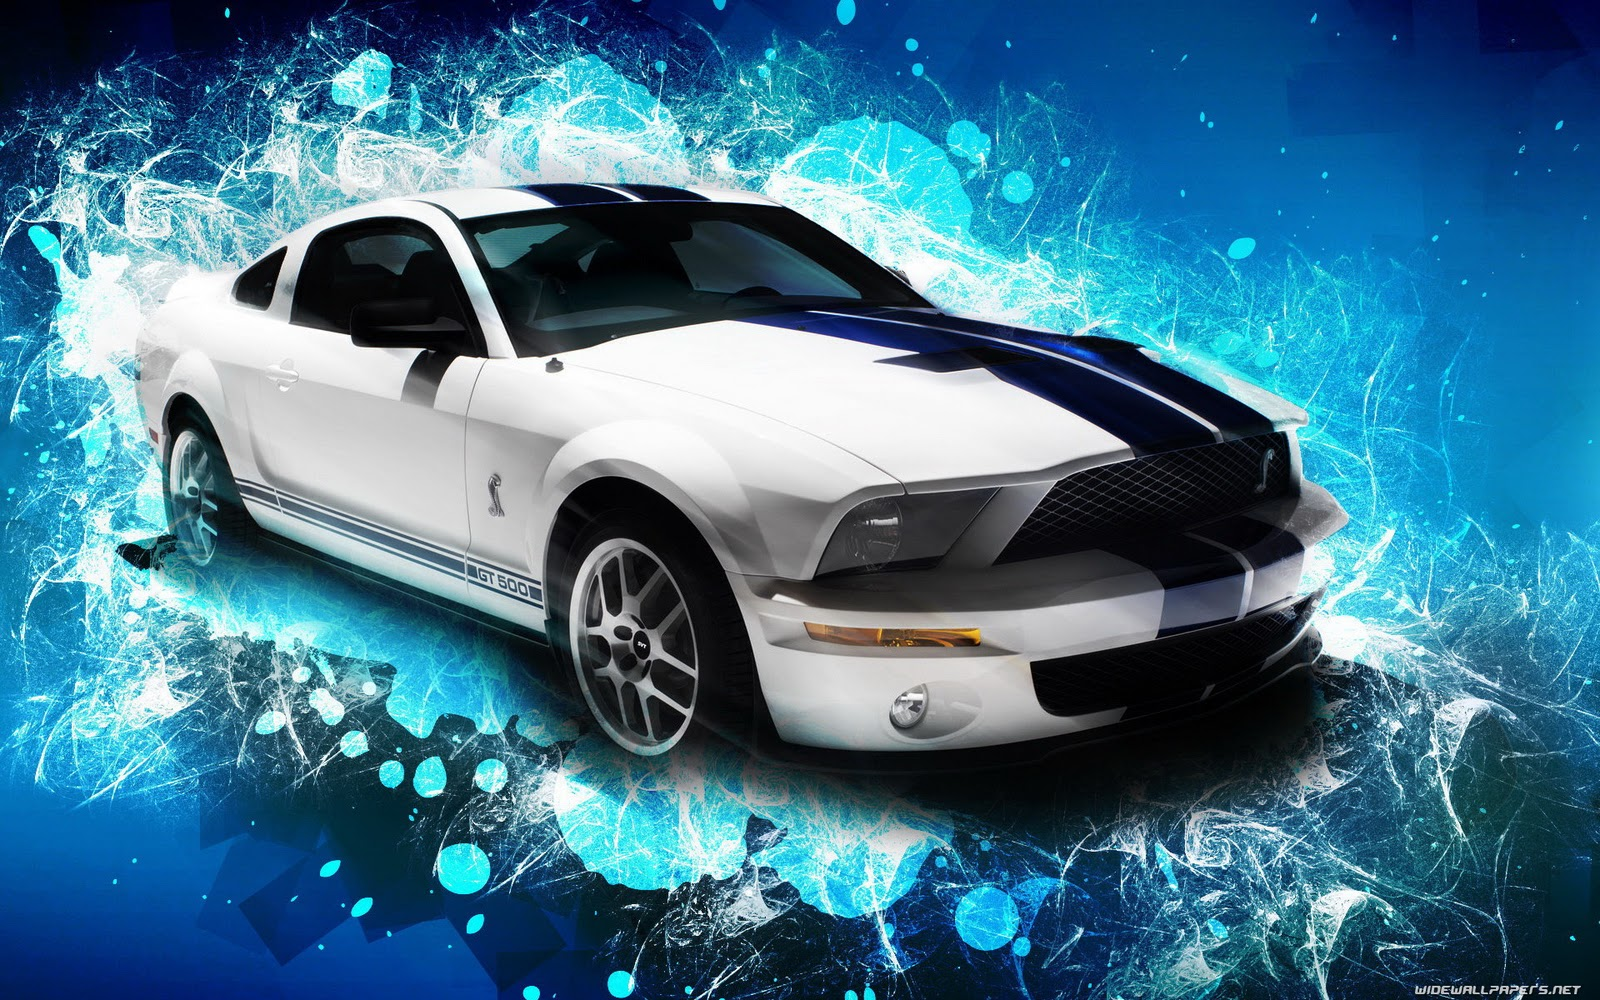 Cool Cars Wallpaper: Cool Mustang Wallpaper